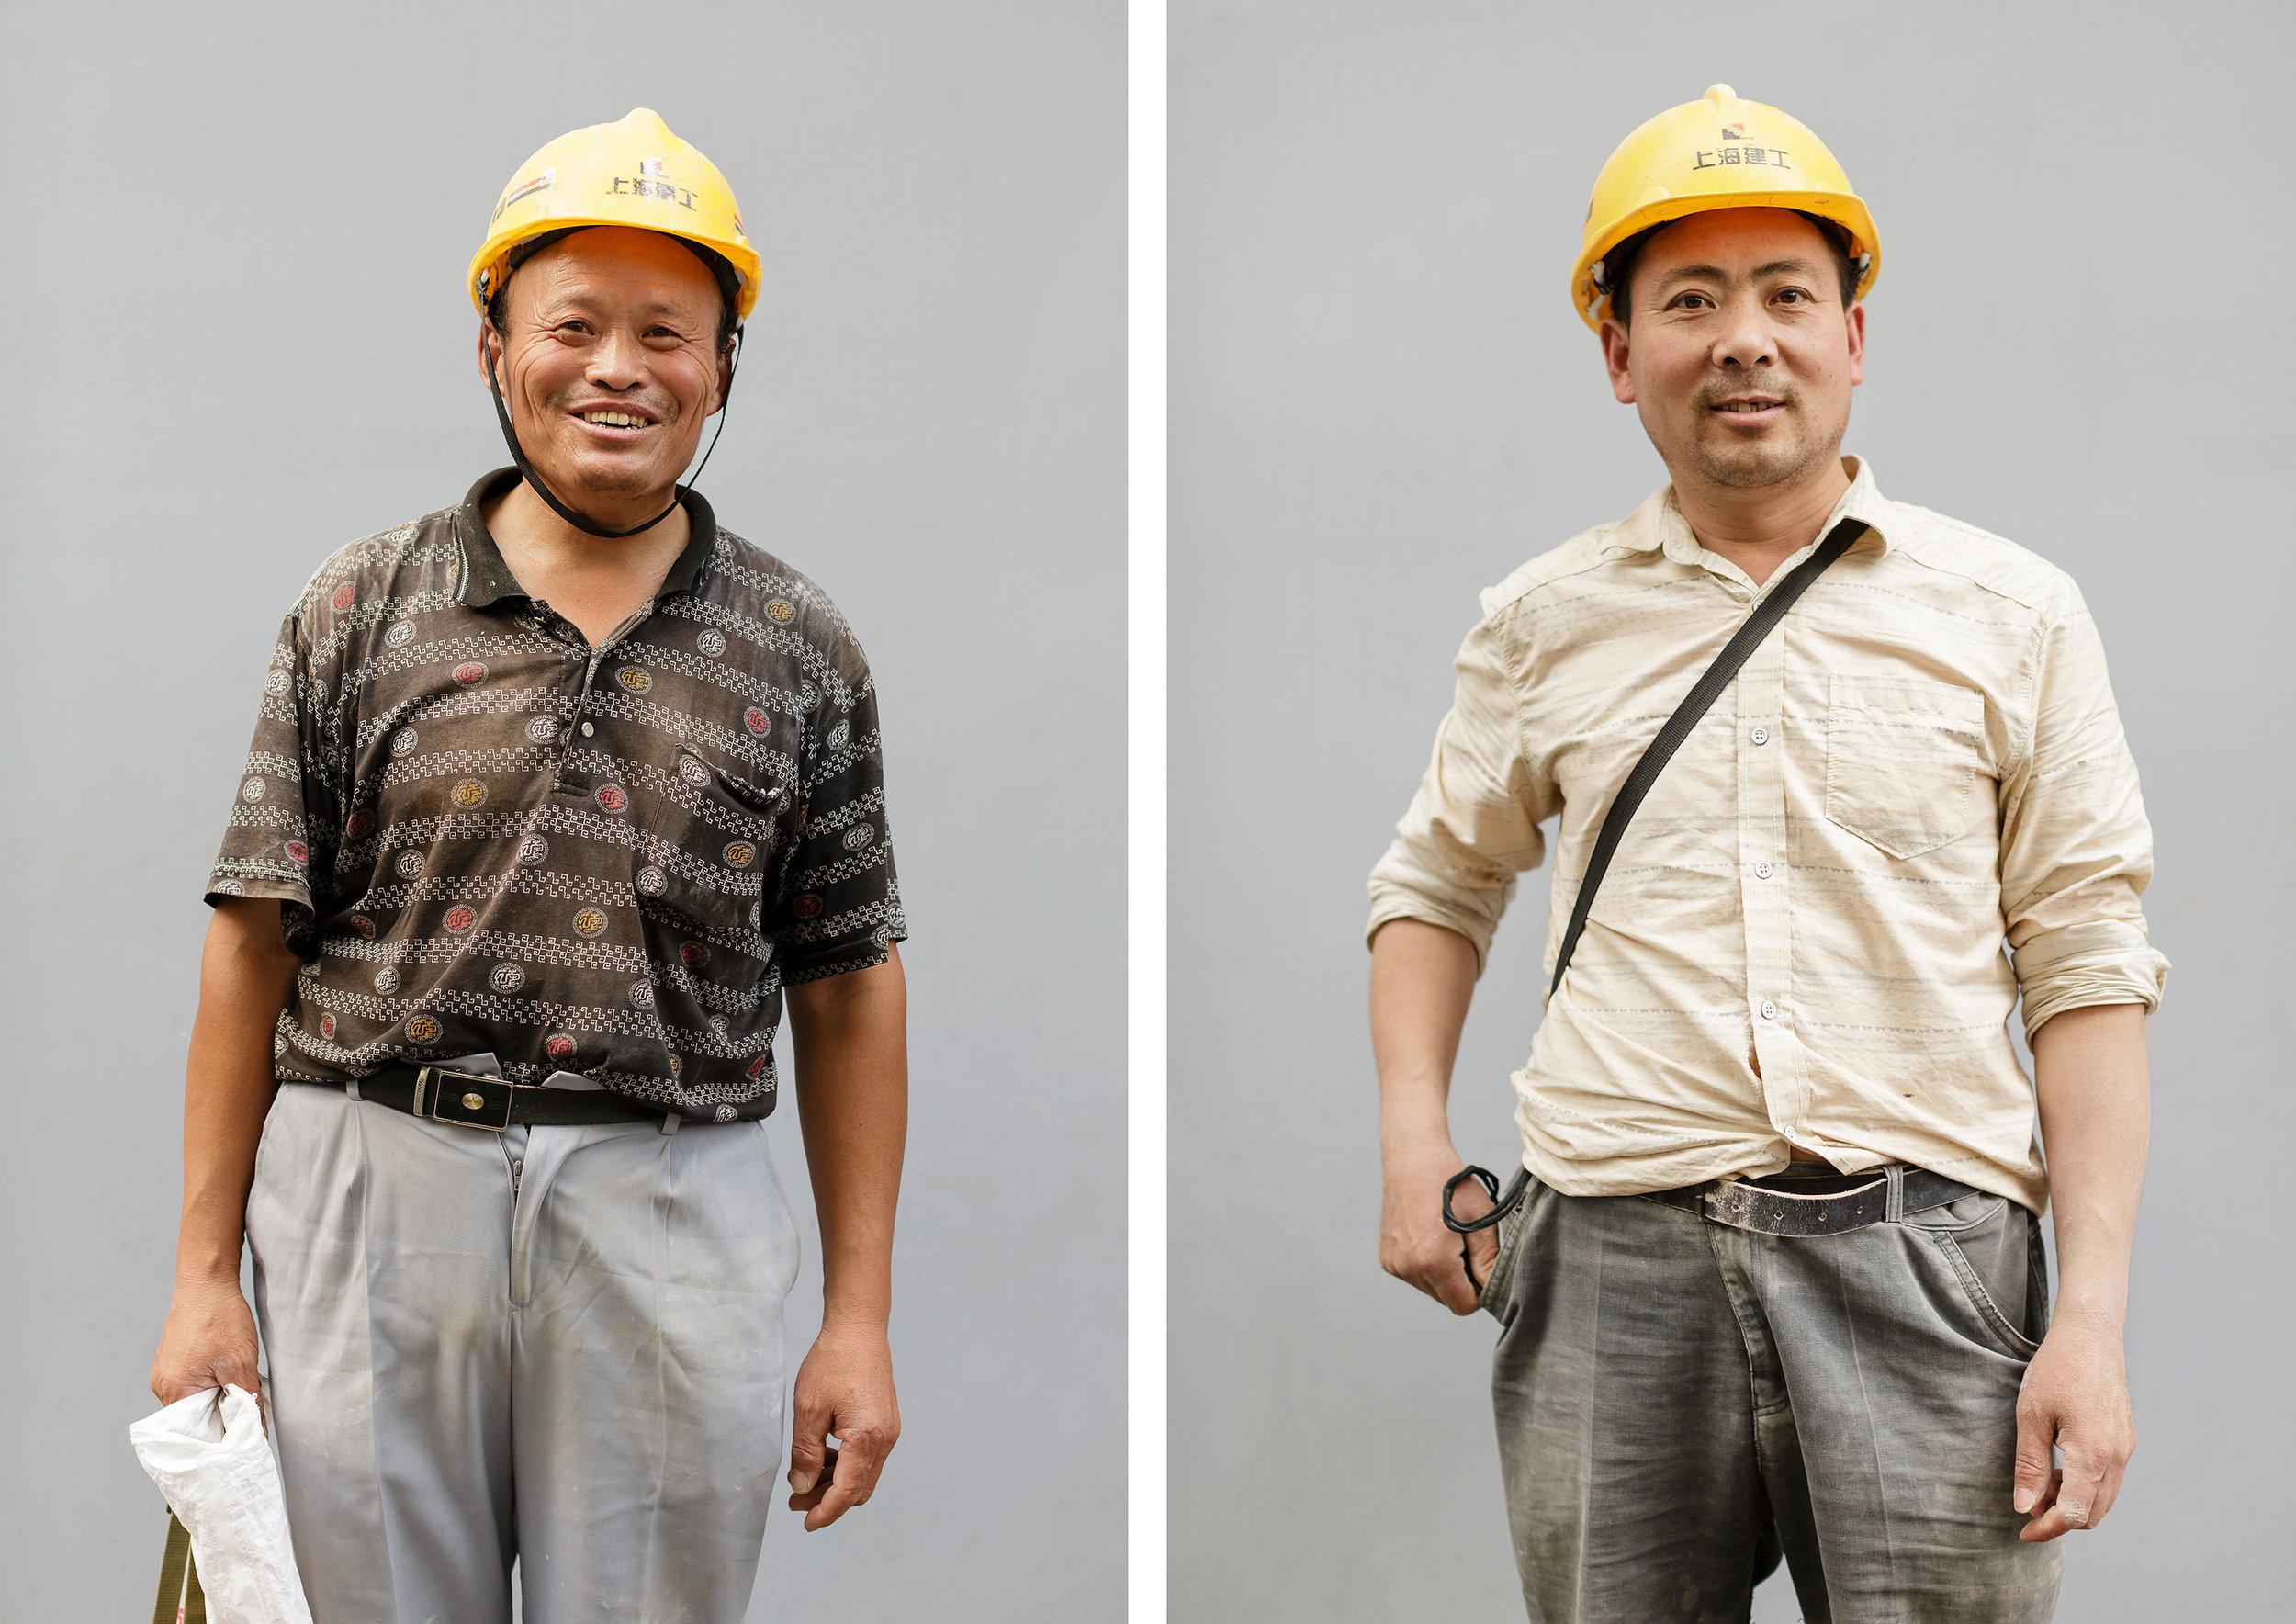 Shanghai_Tower-workers-and-building25.jpg